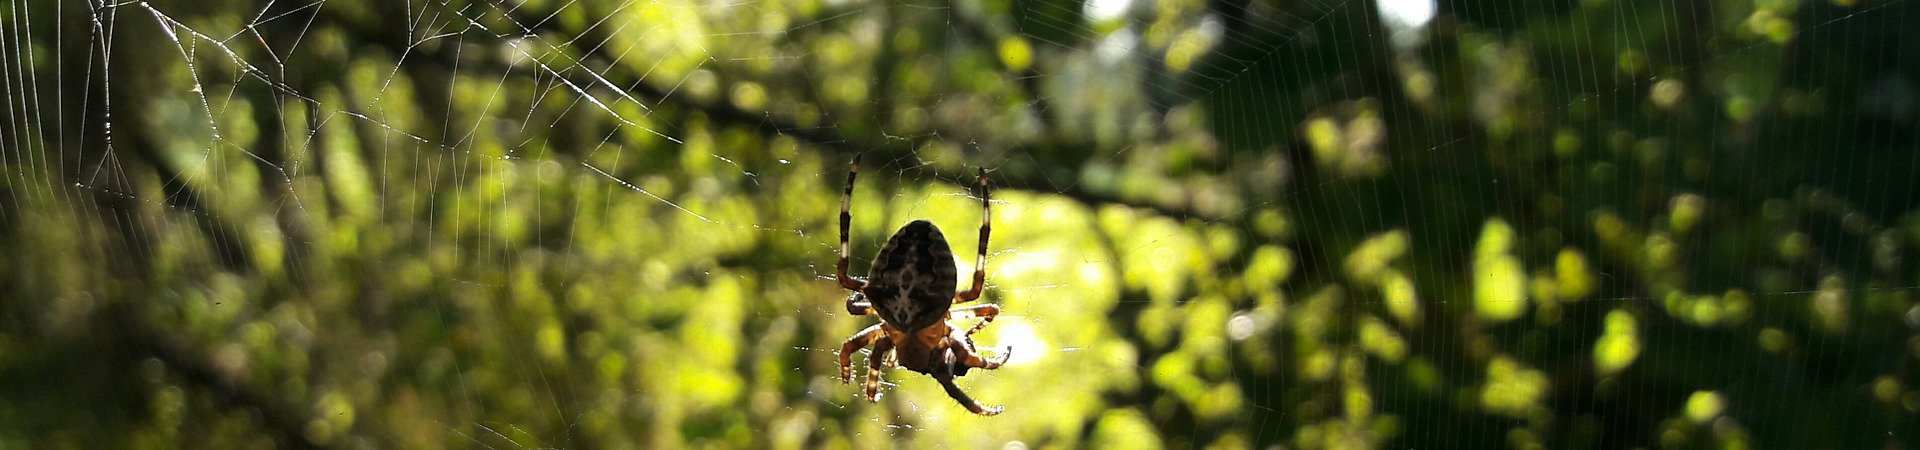 spider-4295682_1920-aspect-ratio-x